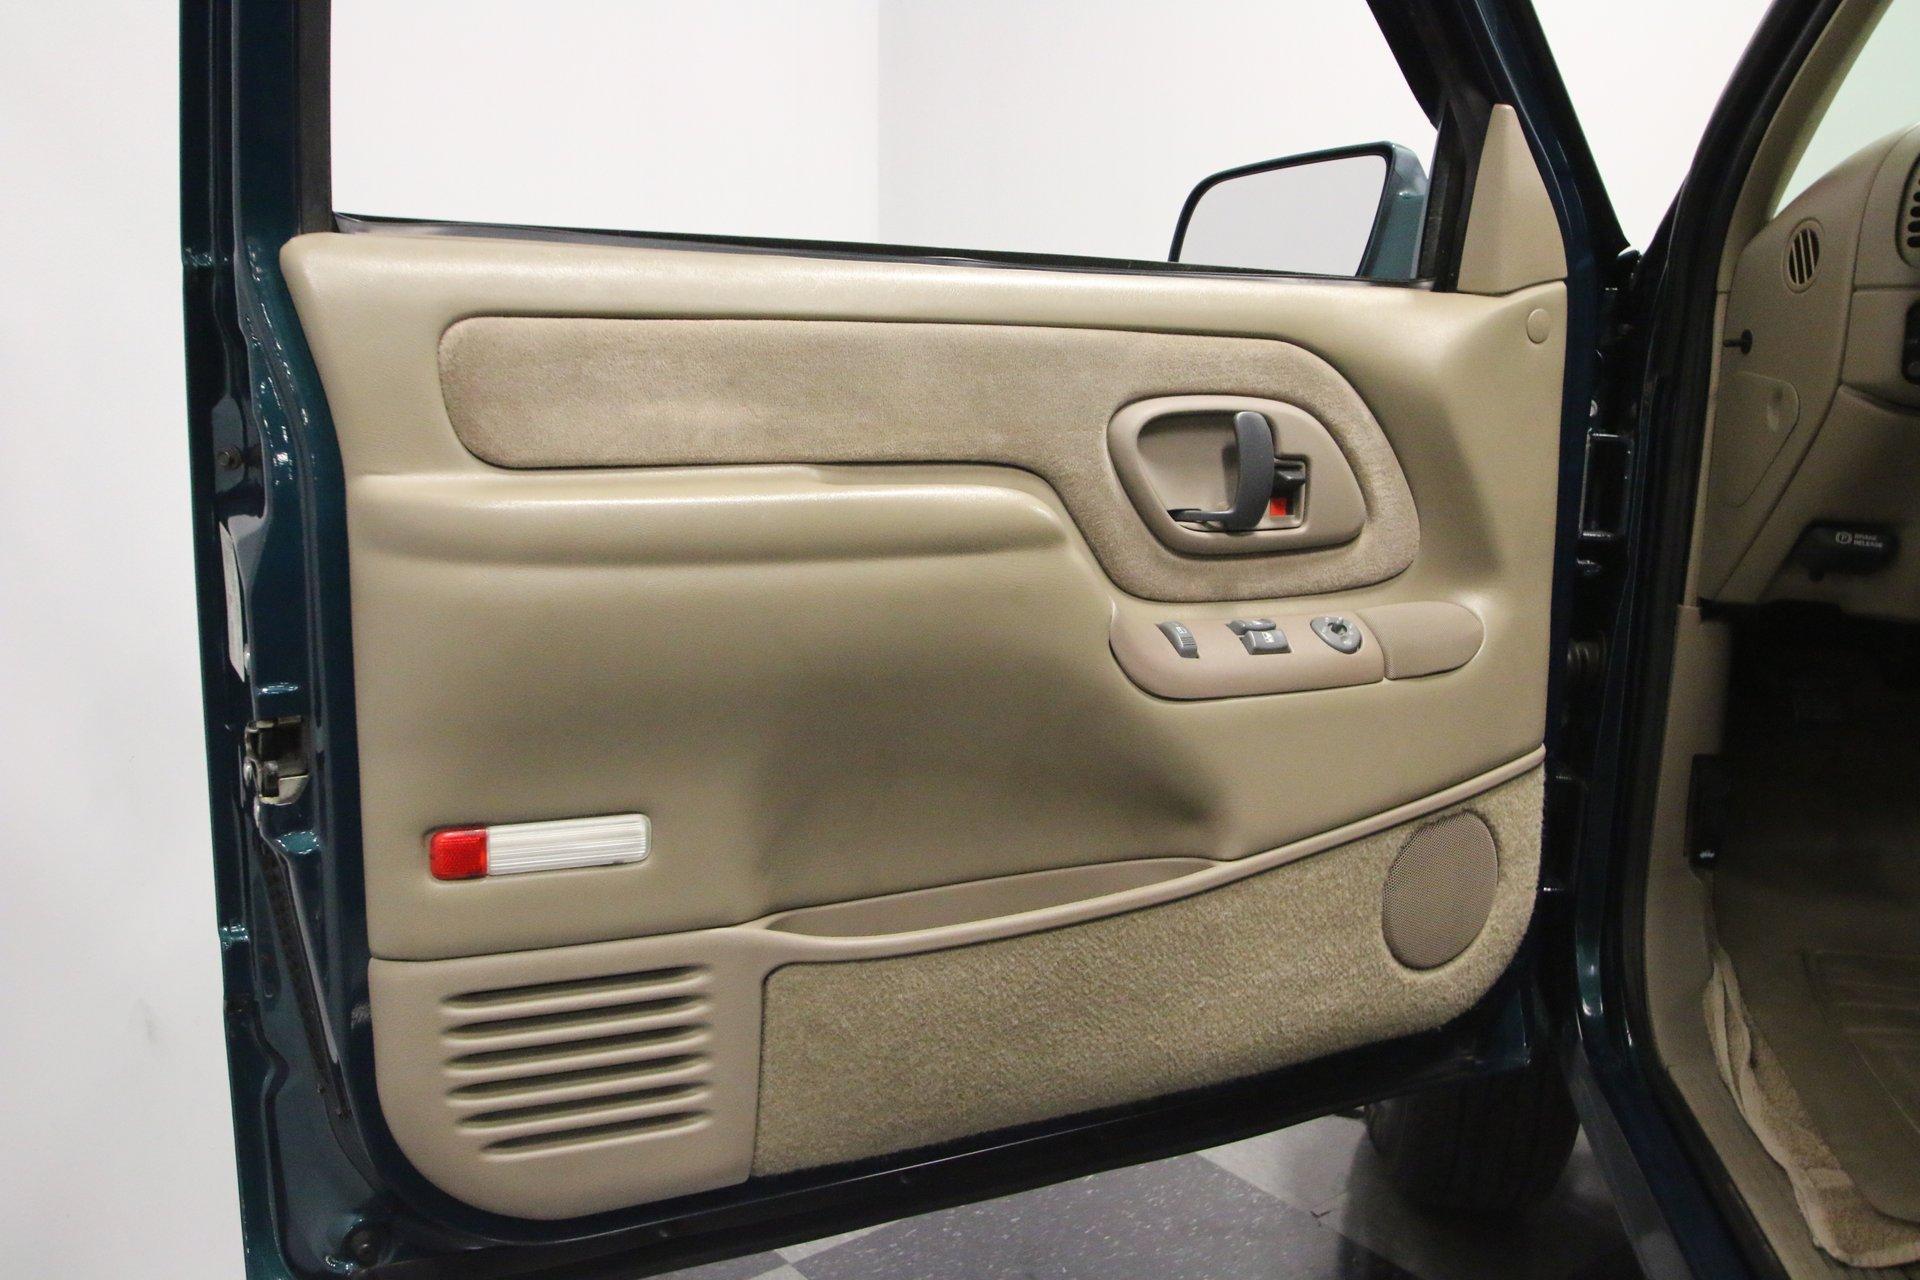 1998 Chevrolet 3500 | Streetside Classics - The Nation's